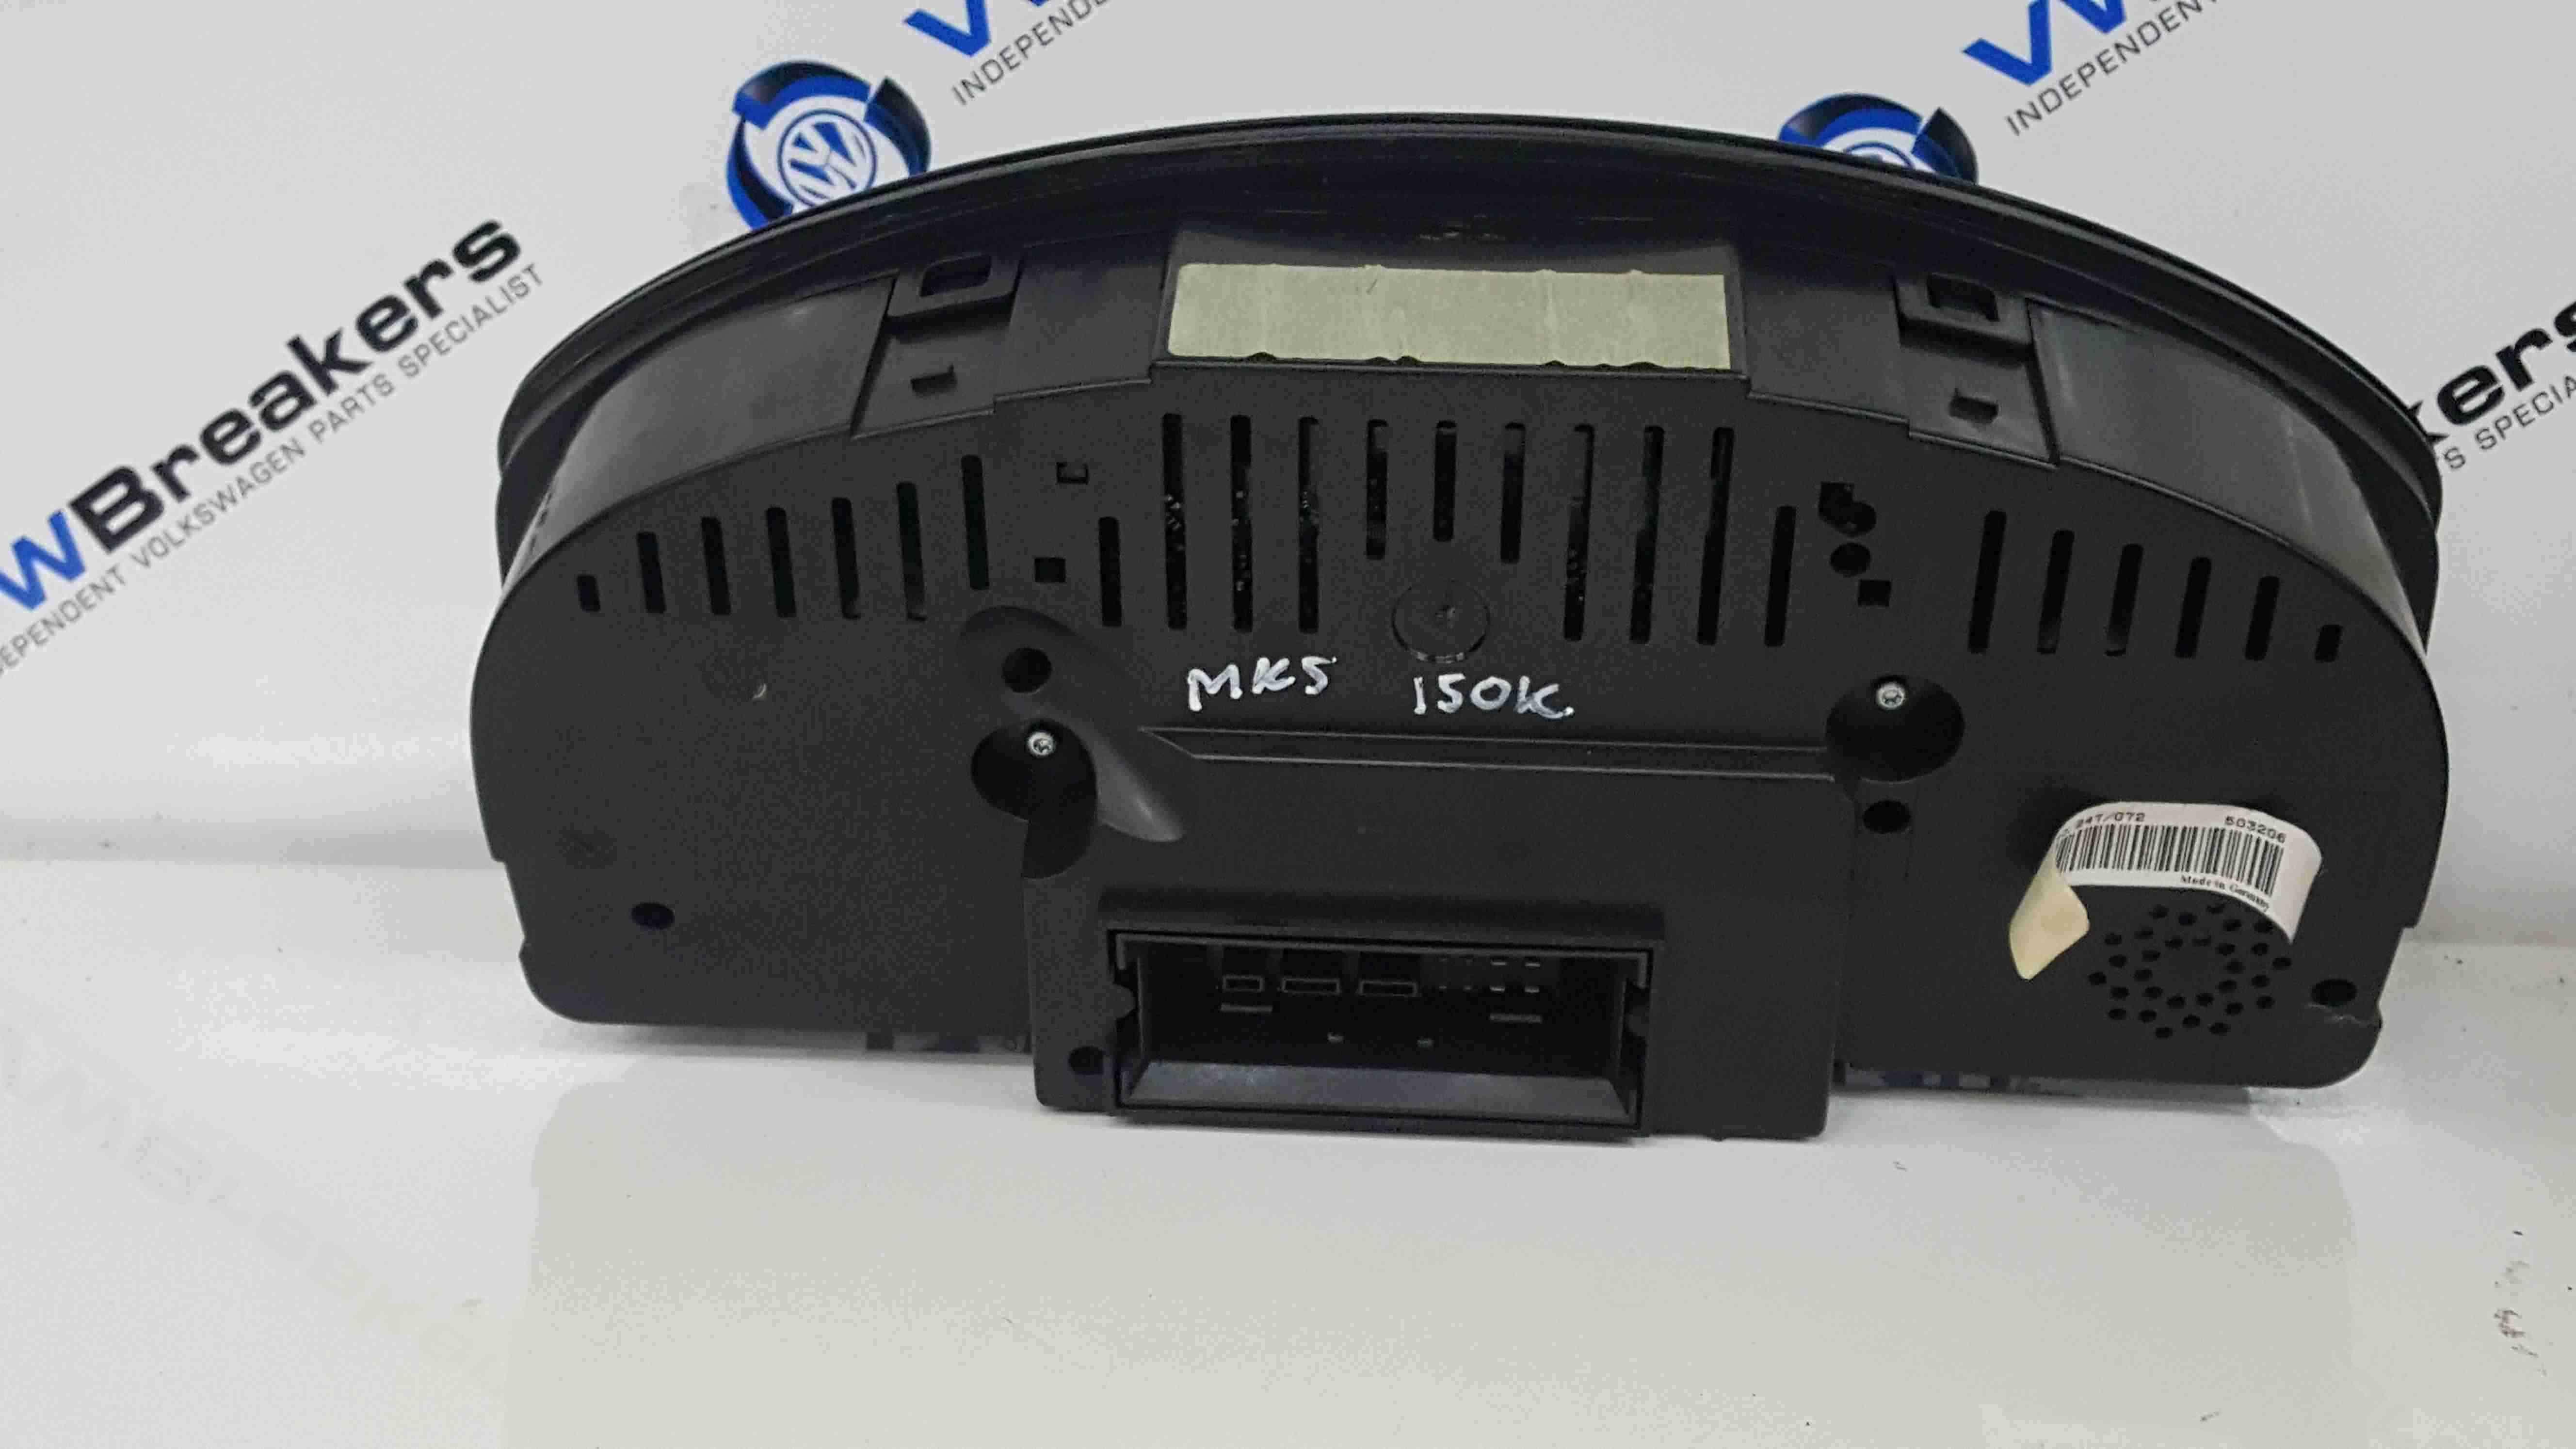 Volkswagen Golf MK5 2003-2009 Instrument Panel Dials Gauges Clocks 150K